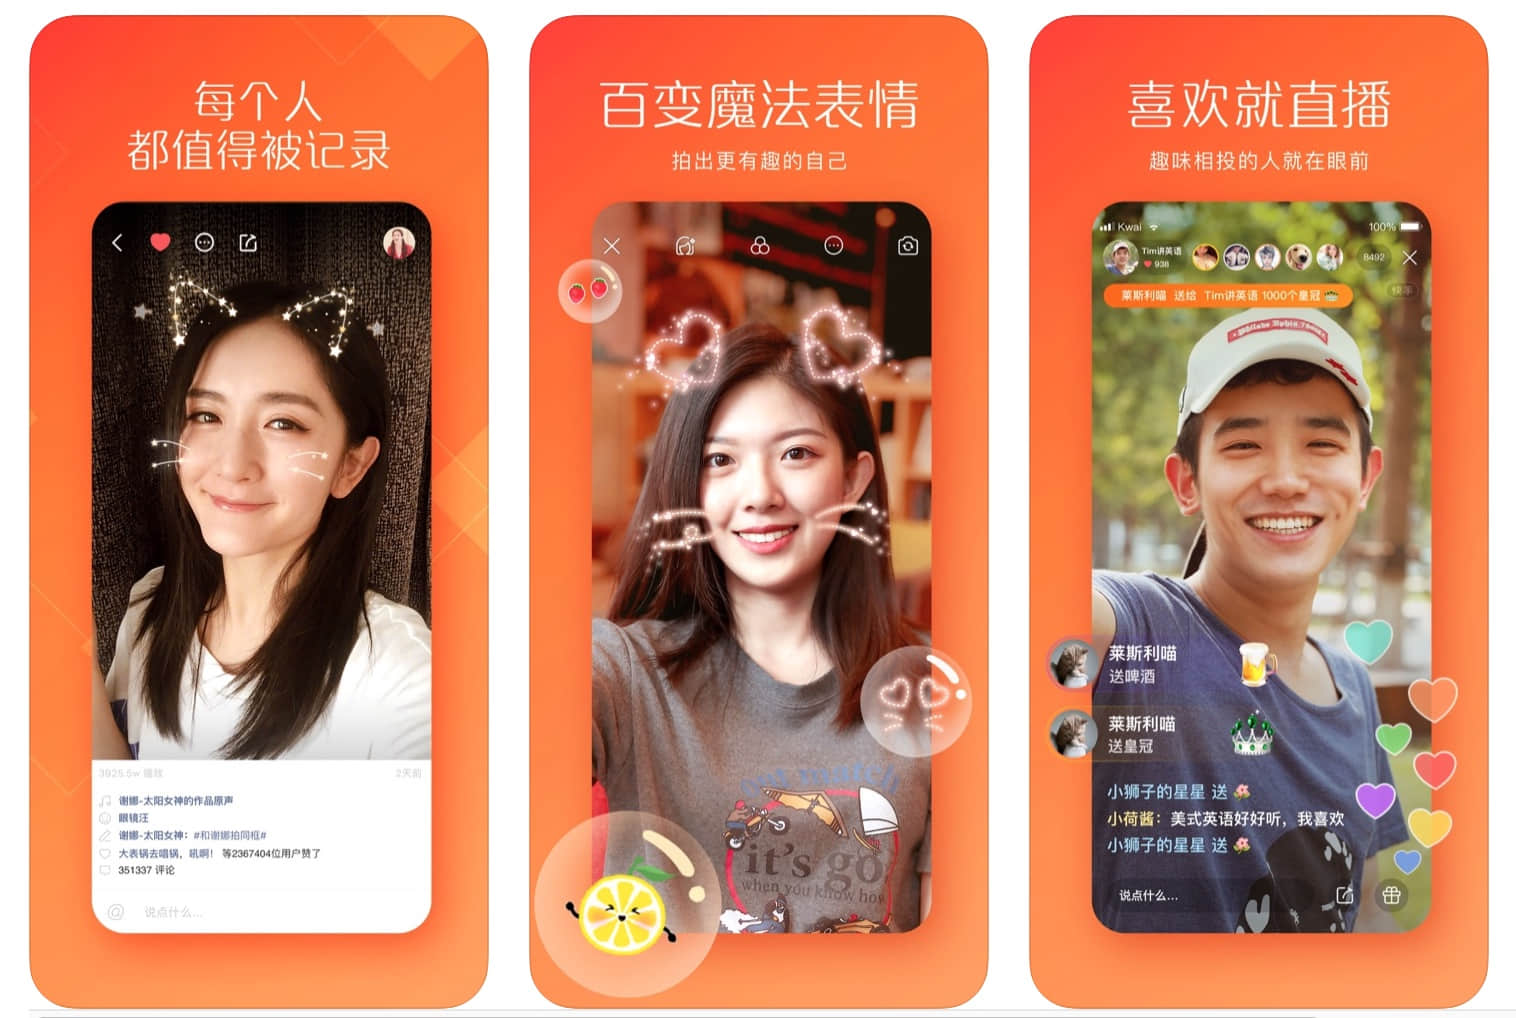 Chinese video app Kuaishou invests 10 billion yuan to build mega data center-cnTechPost